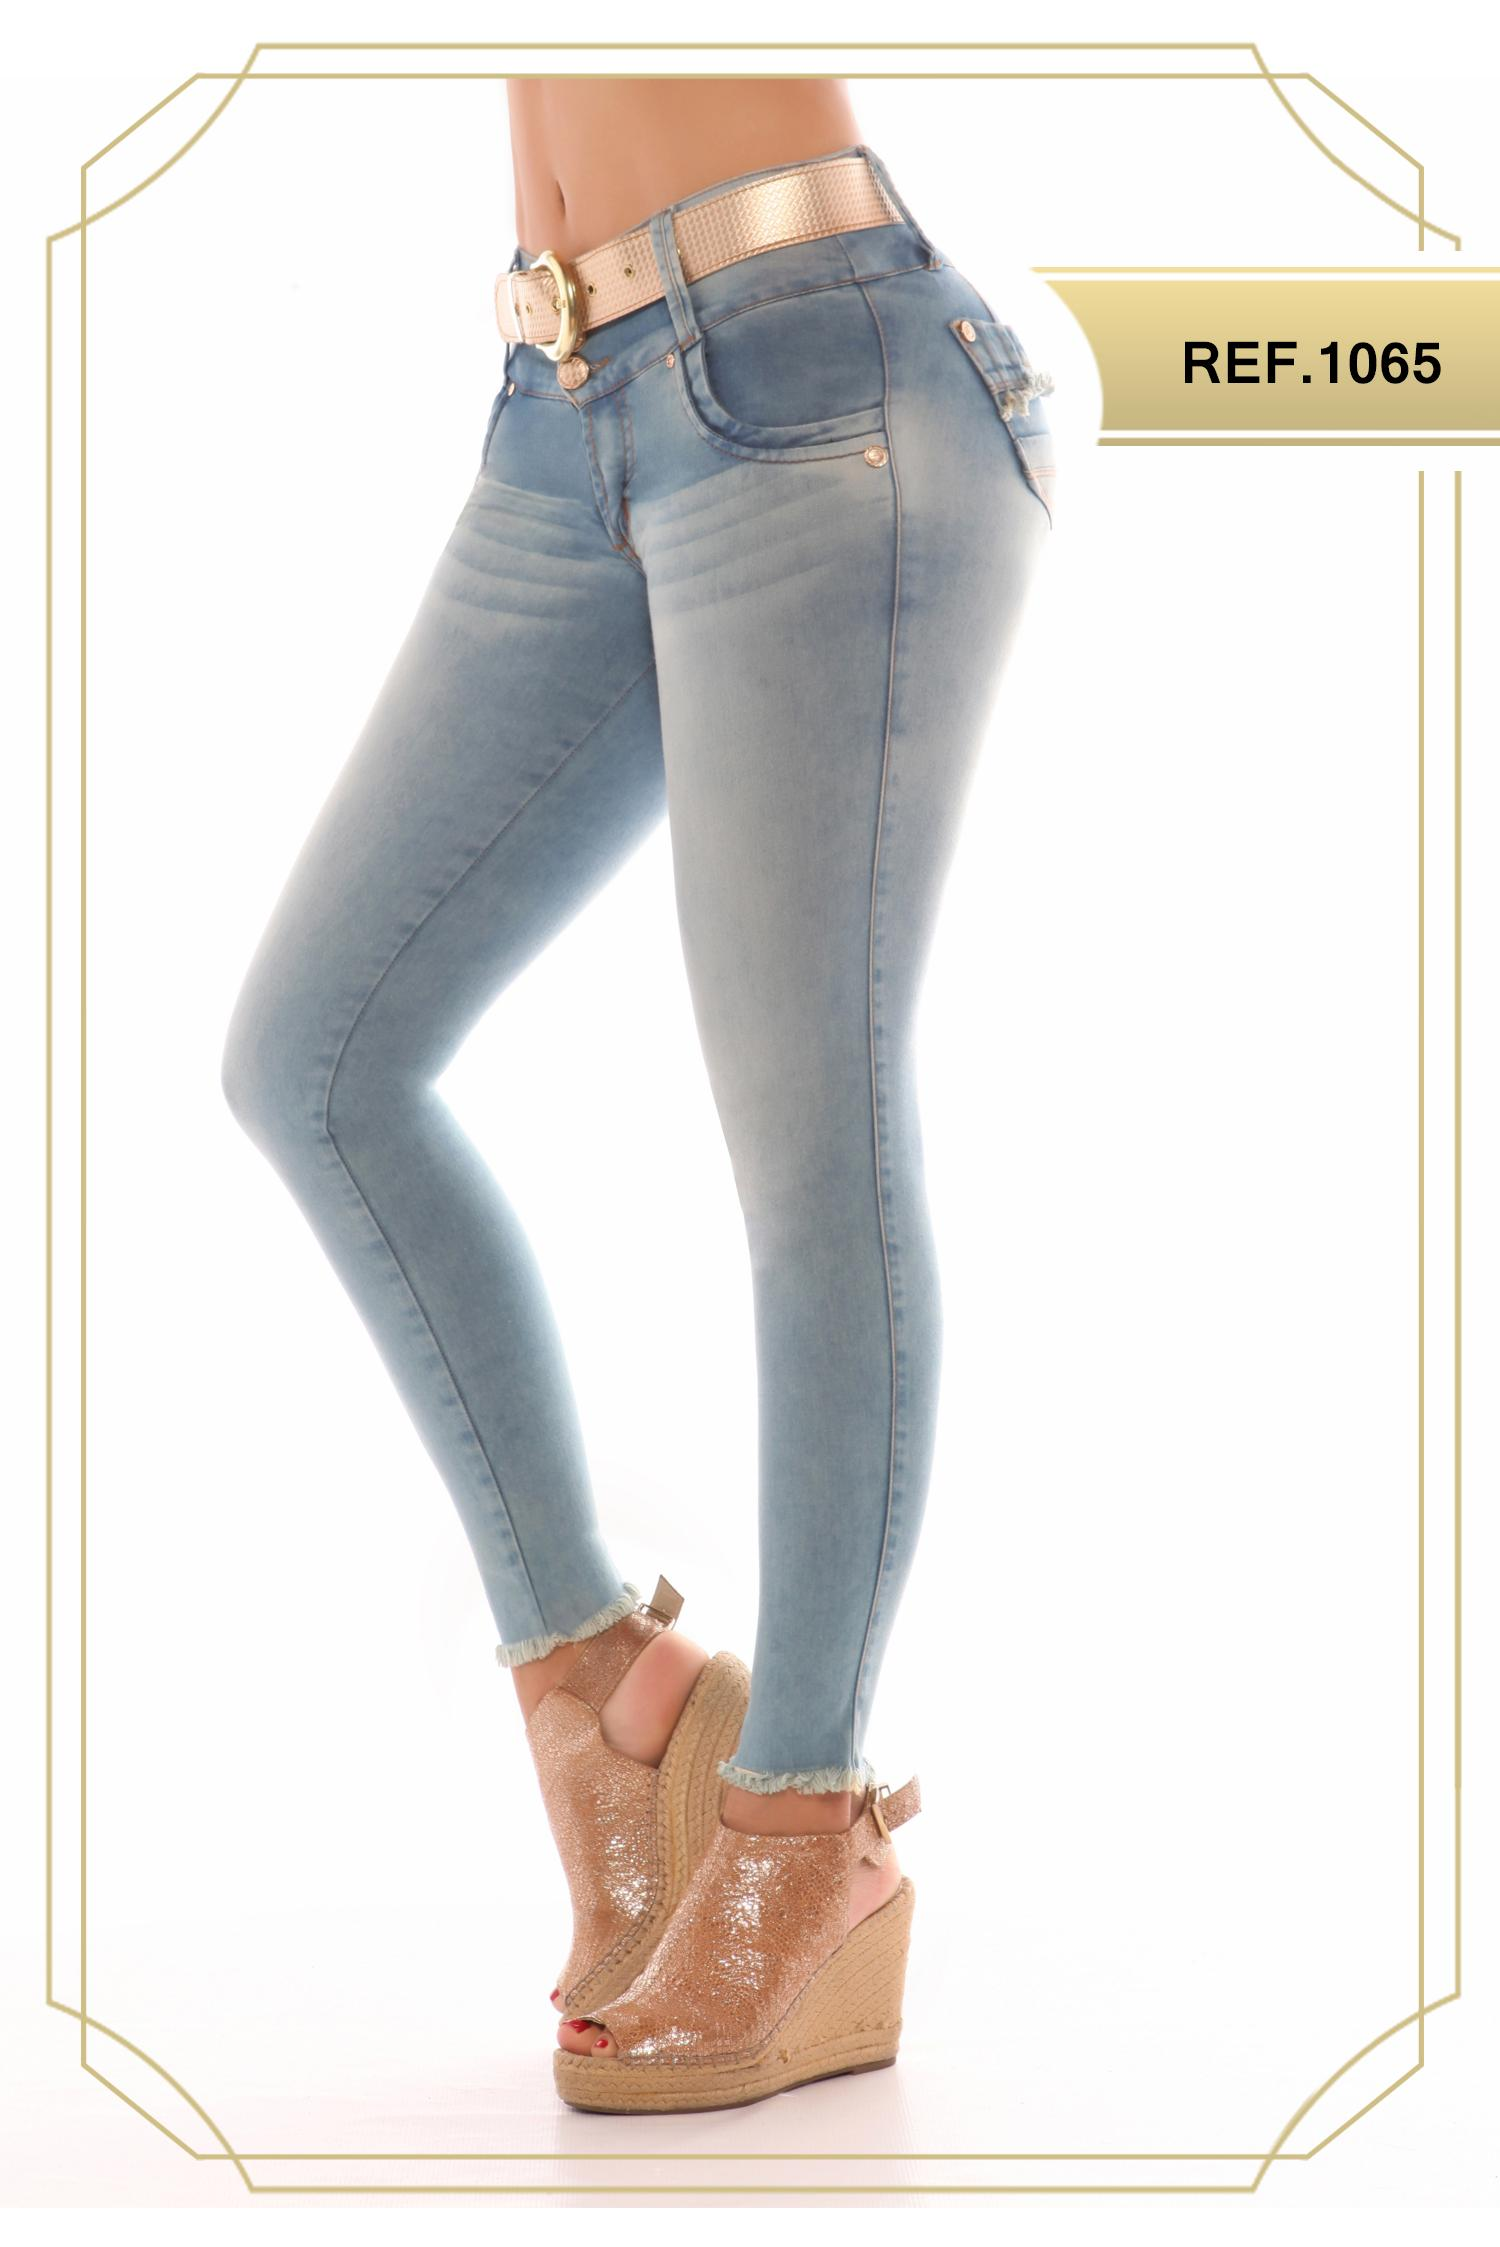 Pantalon Colombiano de Dama Moldeador de venta en España